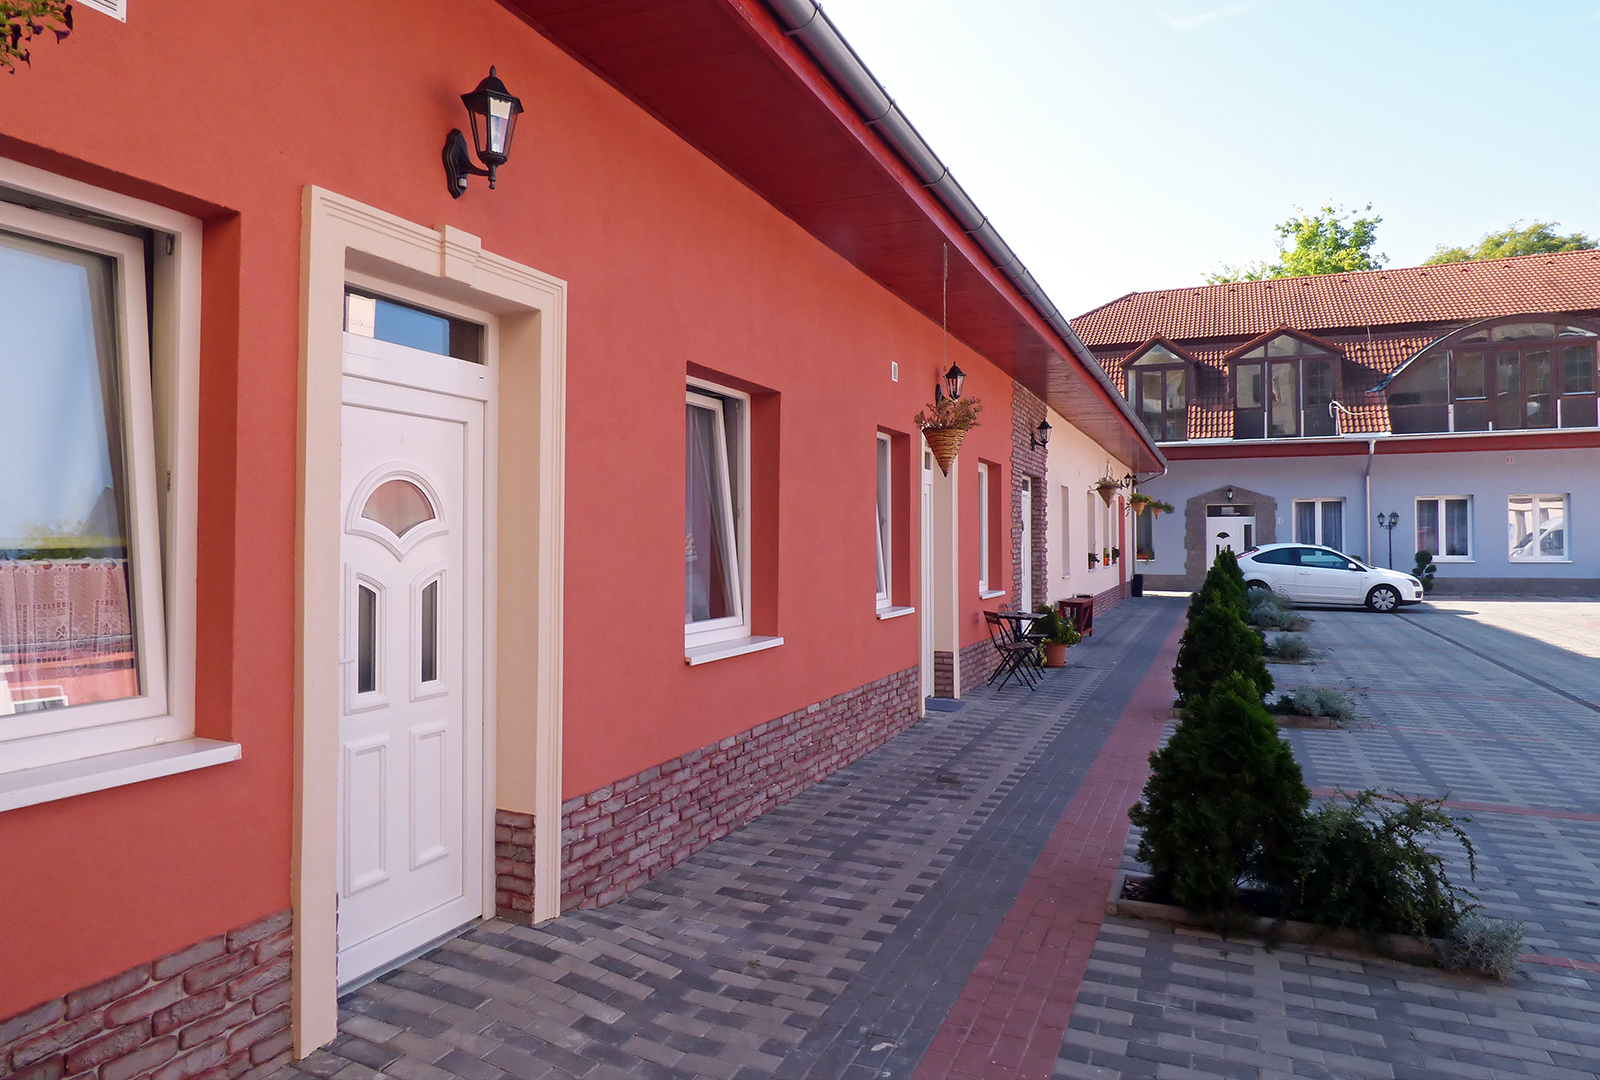 Nagy Lajos király úti REMCO ingatlanegyüttes